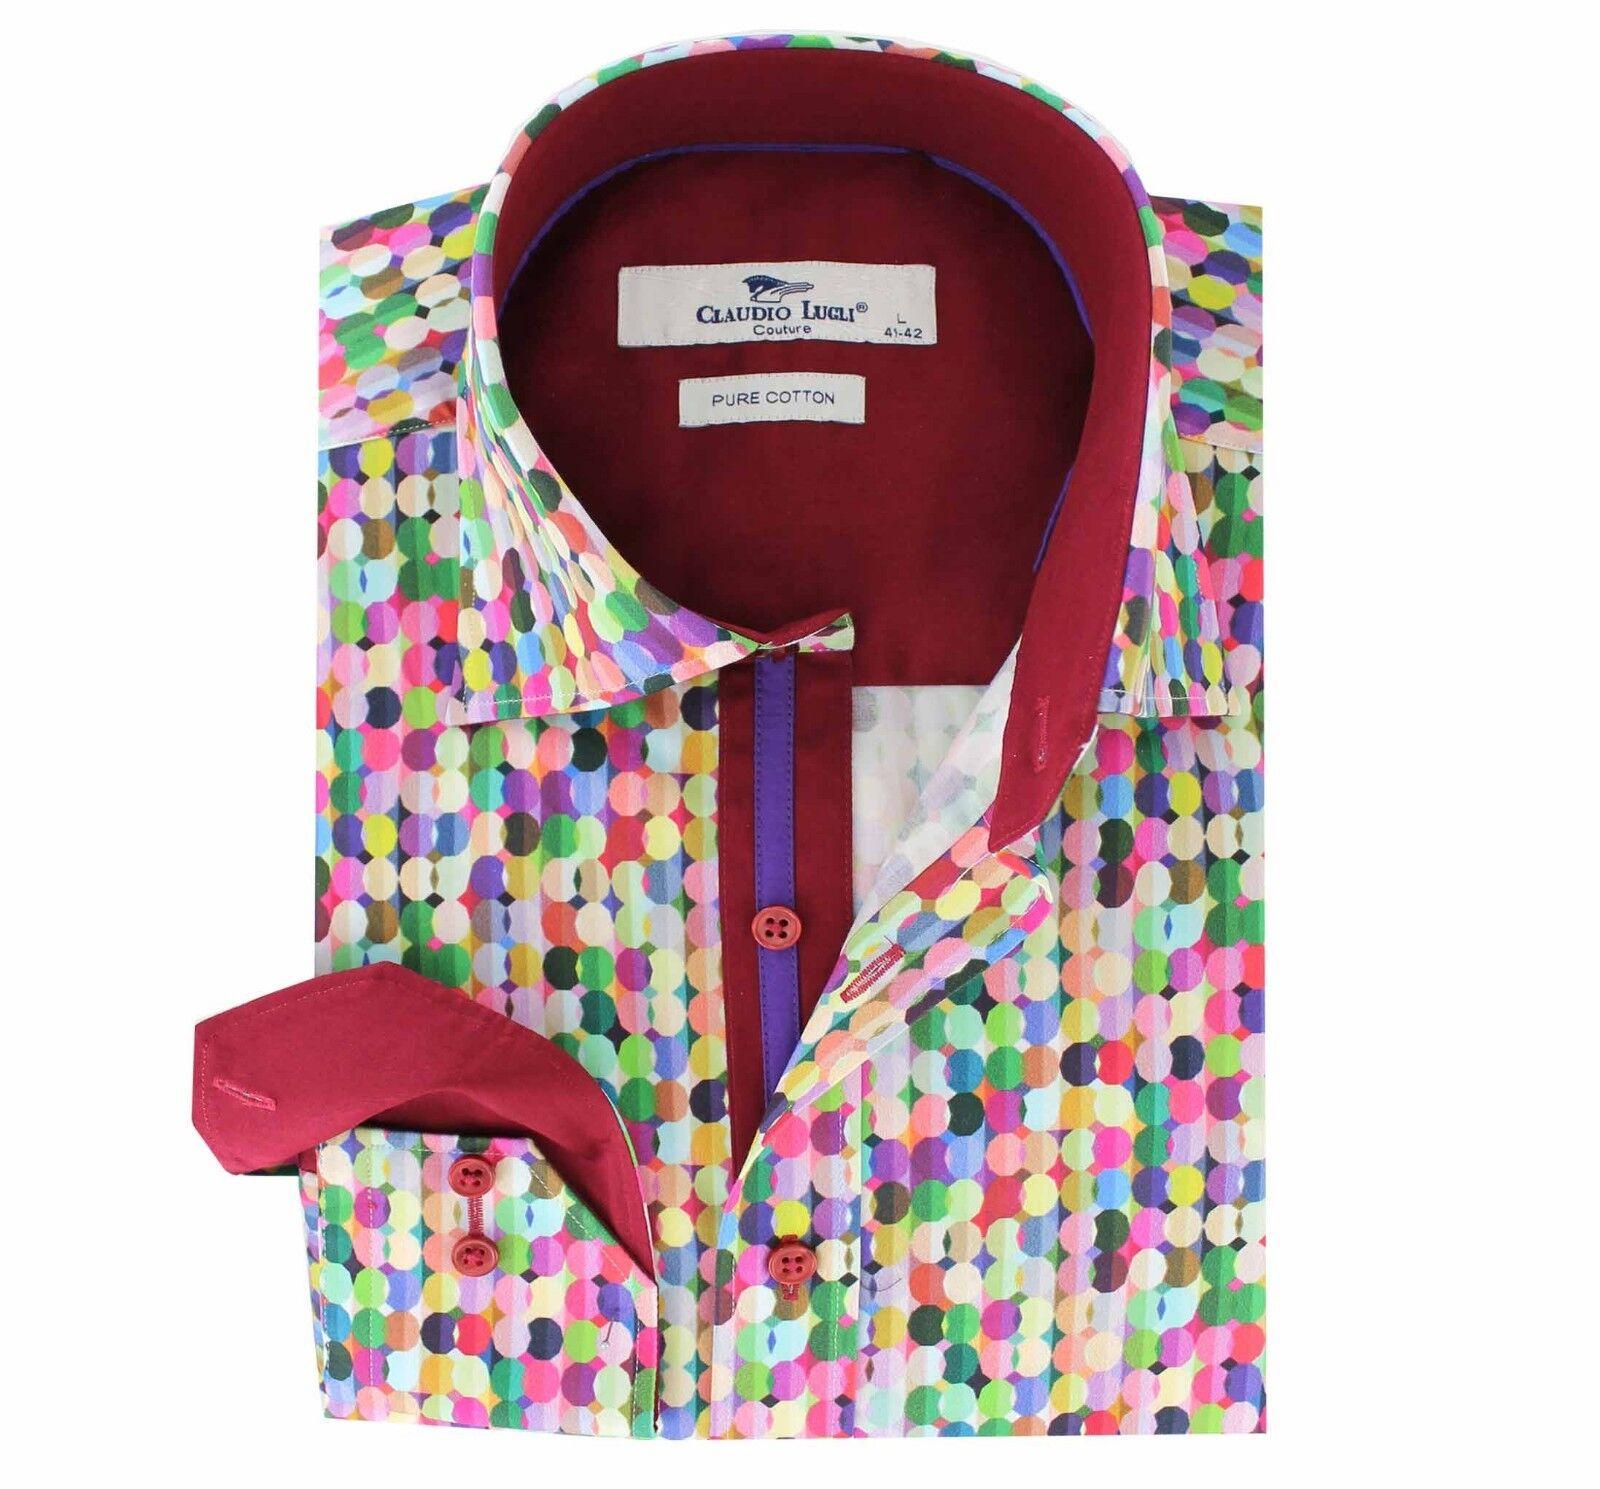 Claudio Lugli Mens shirt -S- CL211 Sweets pattern